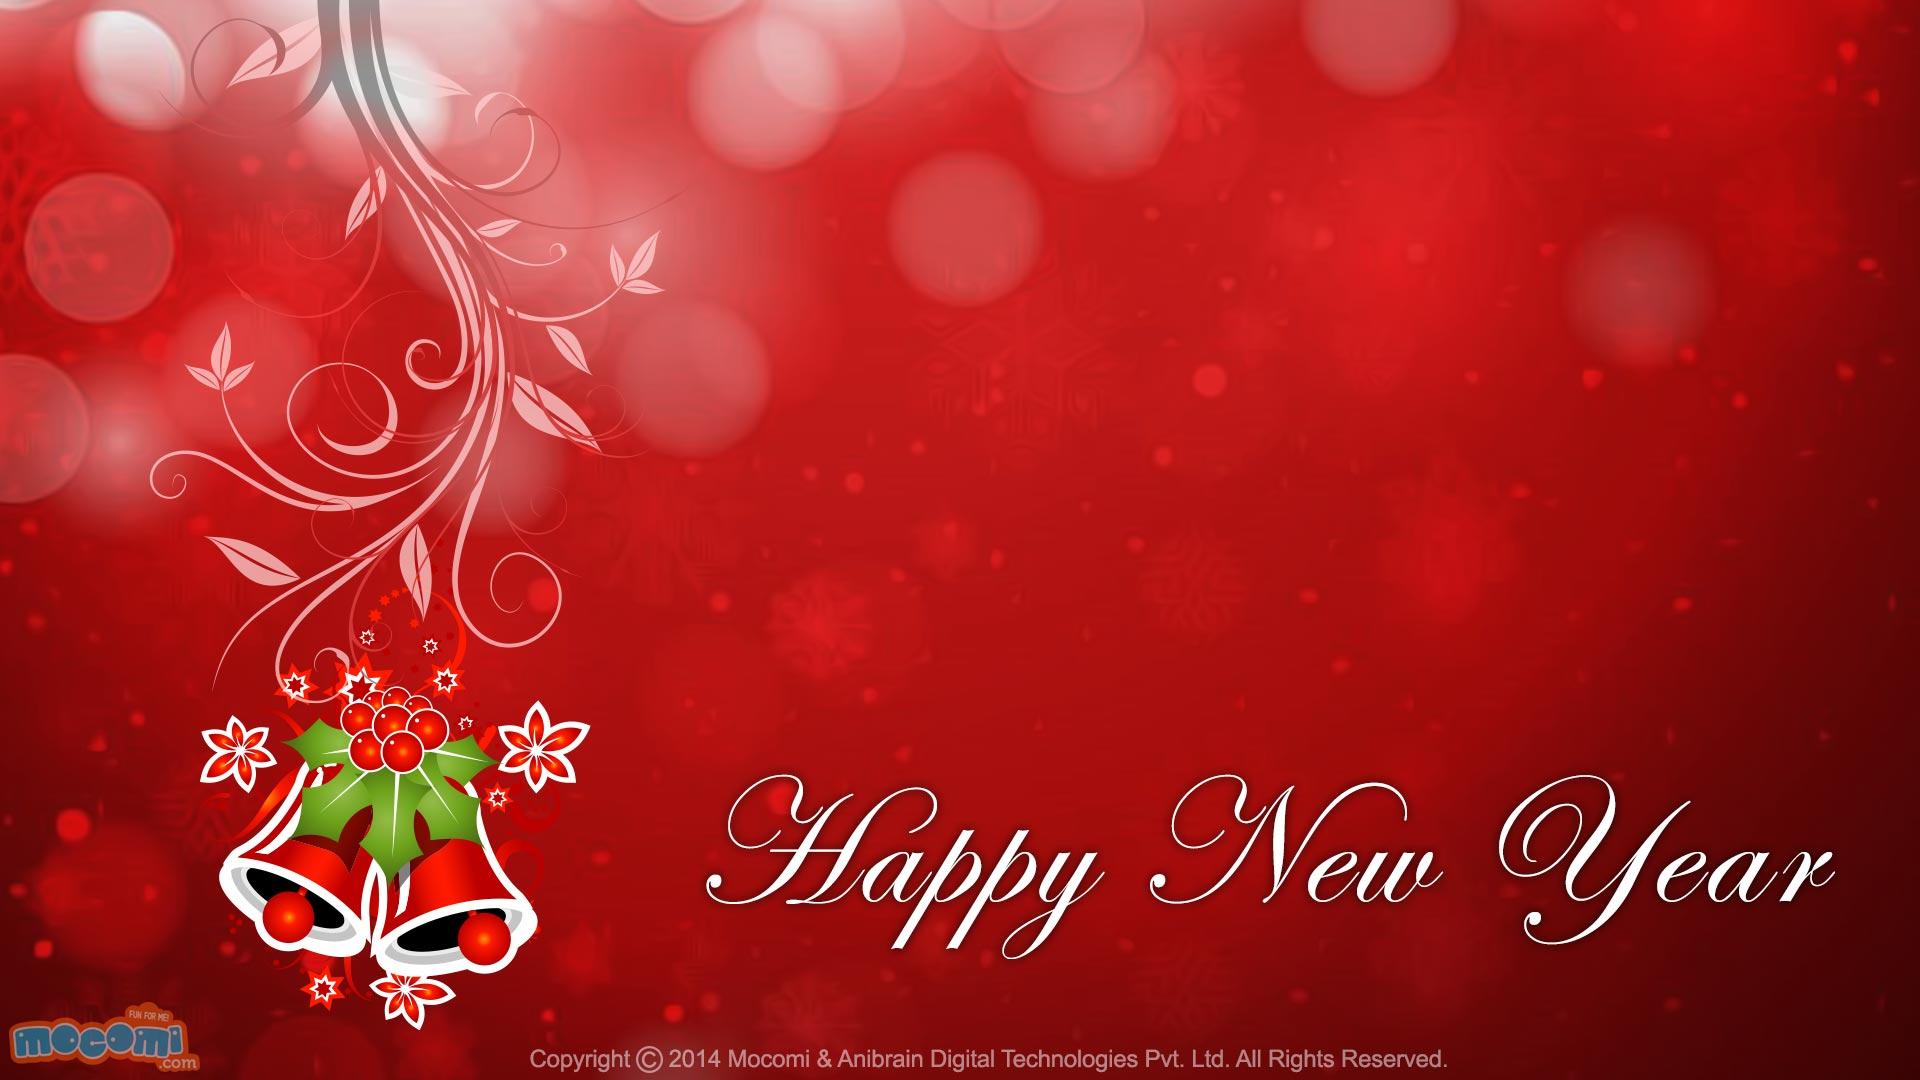 Happy New Year Wallpaper- 13